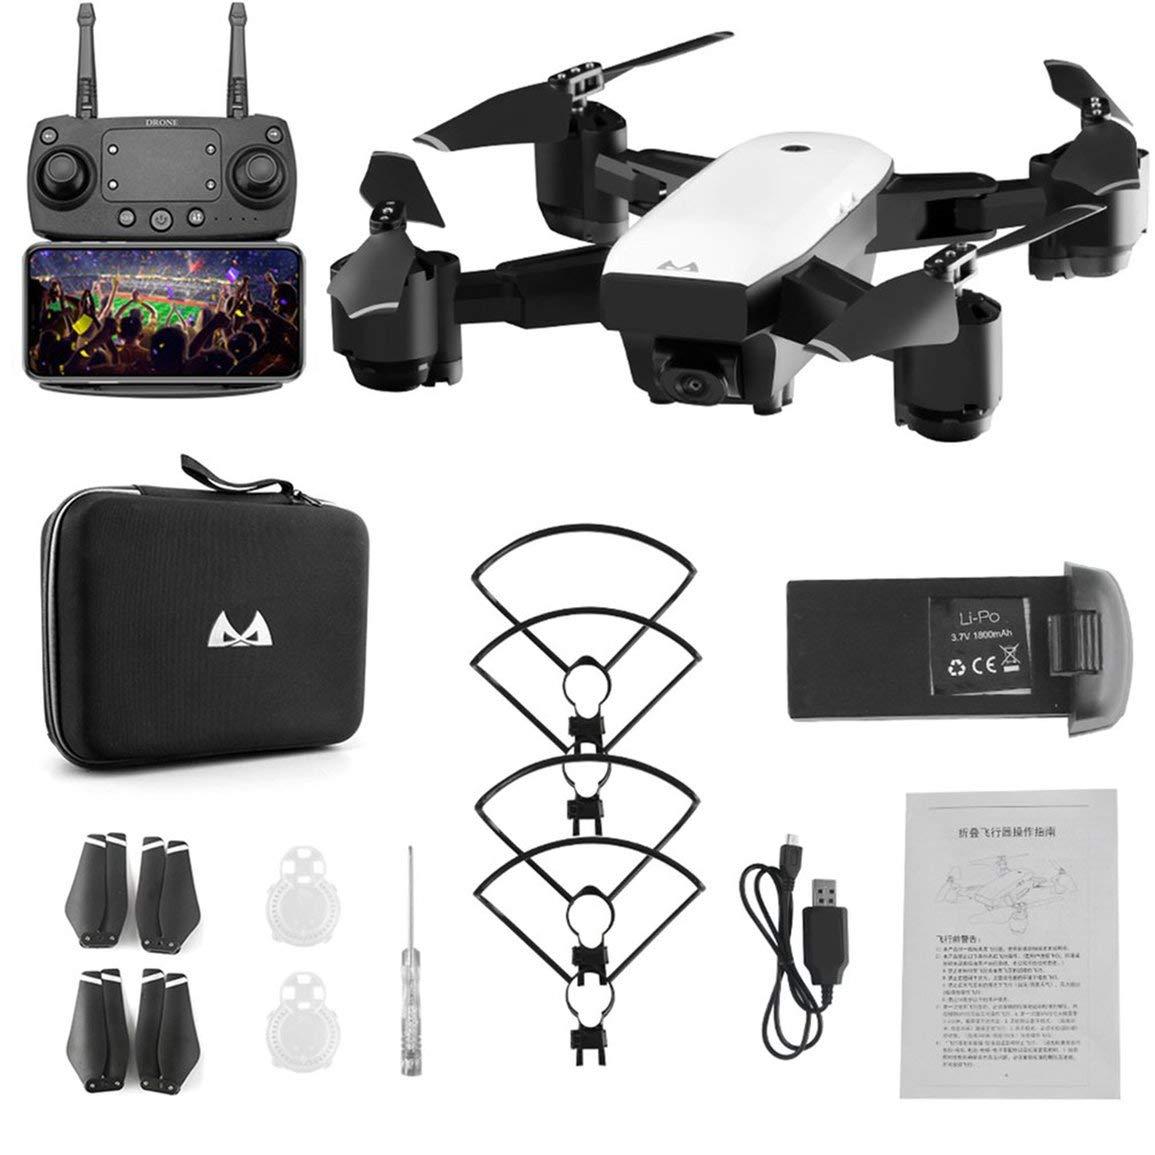 Fantasyworld SMRC S20 6 Achsen Gyro FPV Drone Tragbare RC mit Quadrocopter mit RC 720P Kamera-Folding RC Hubschrauber Tragbare RC Modell 4c0415